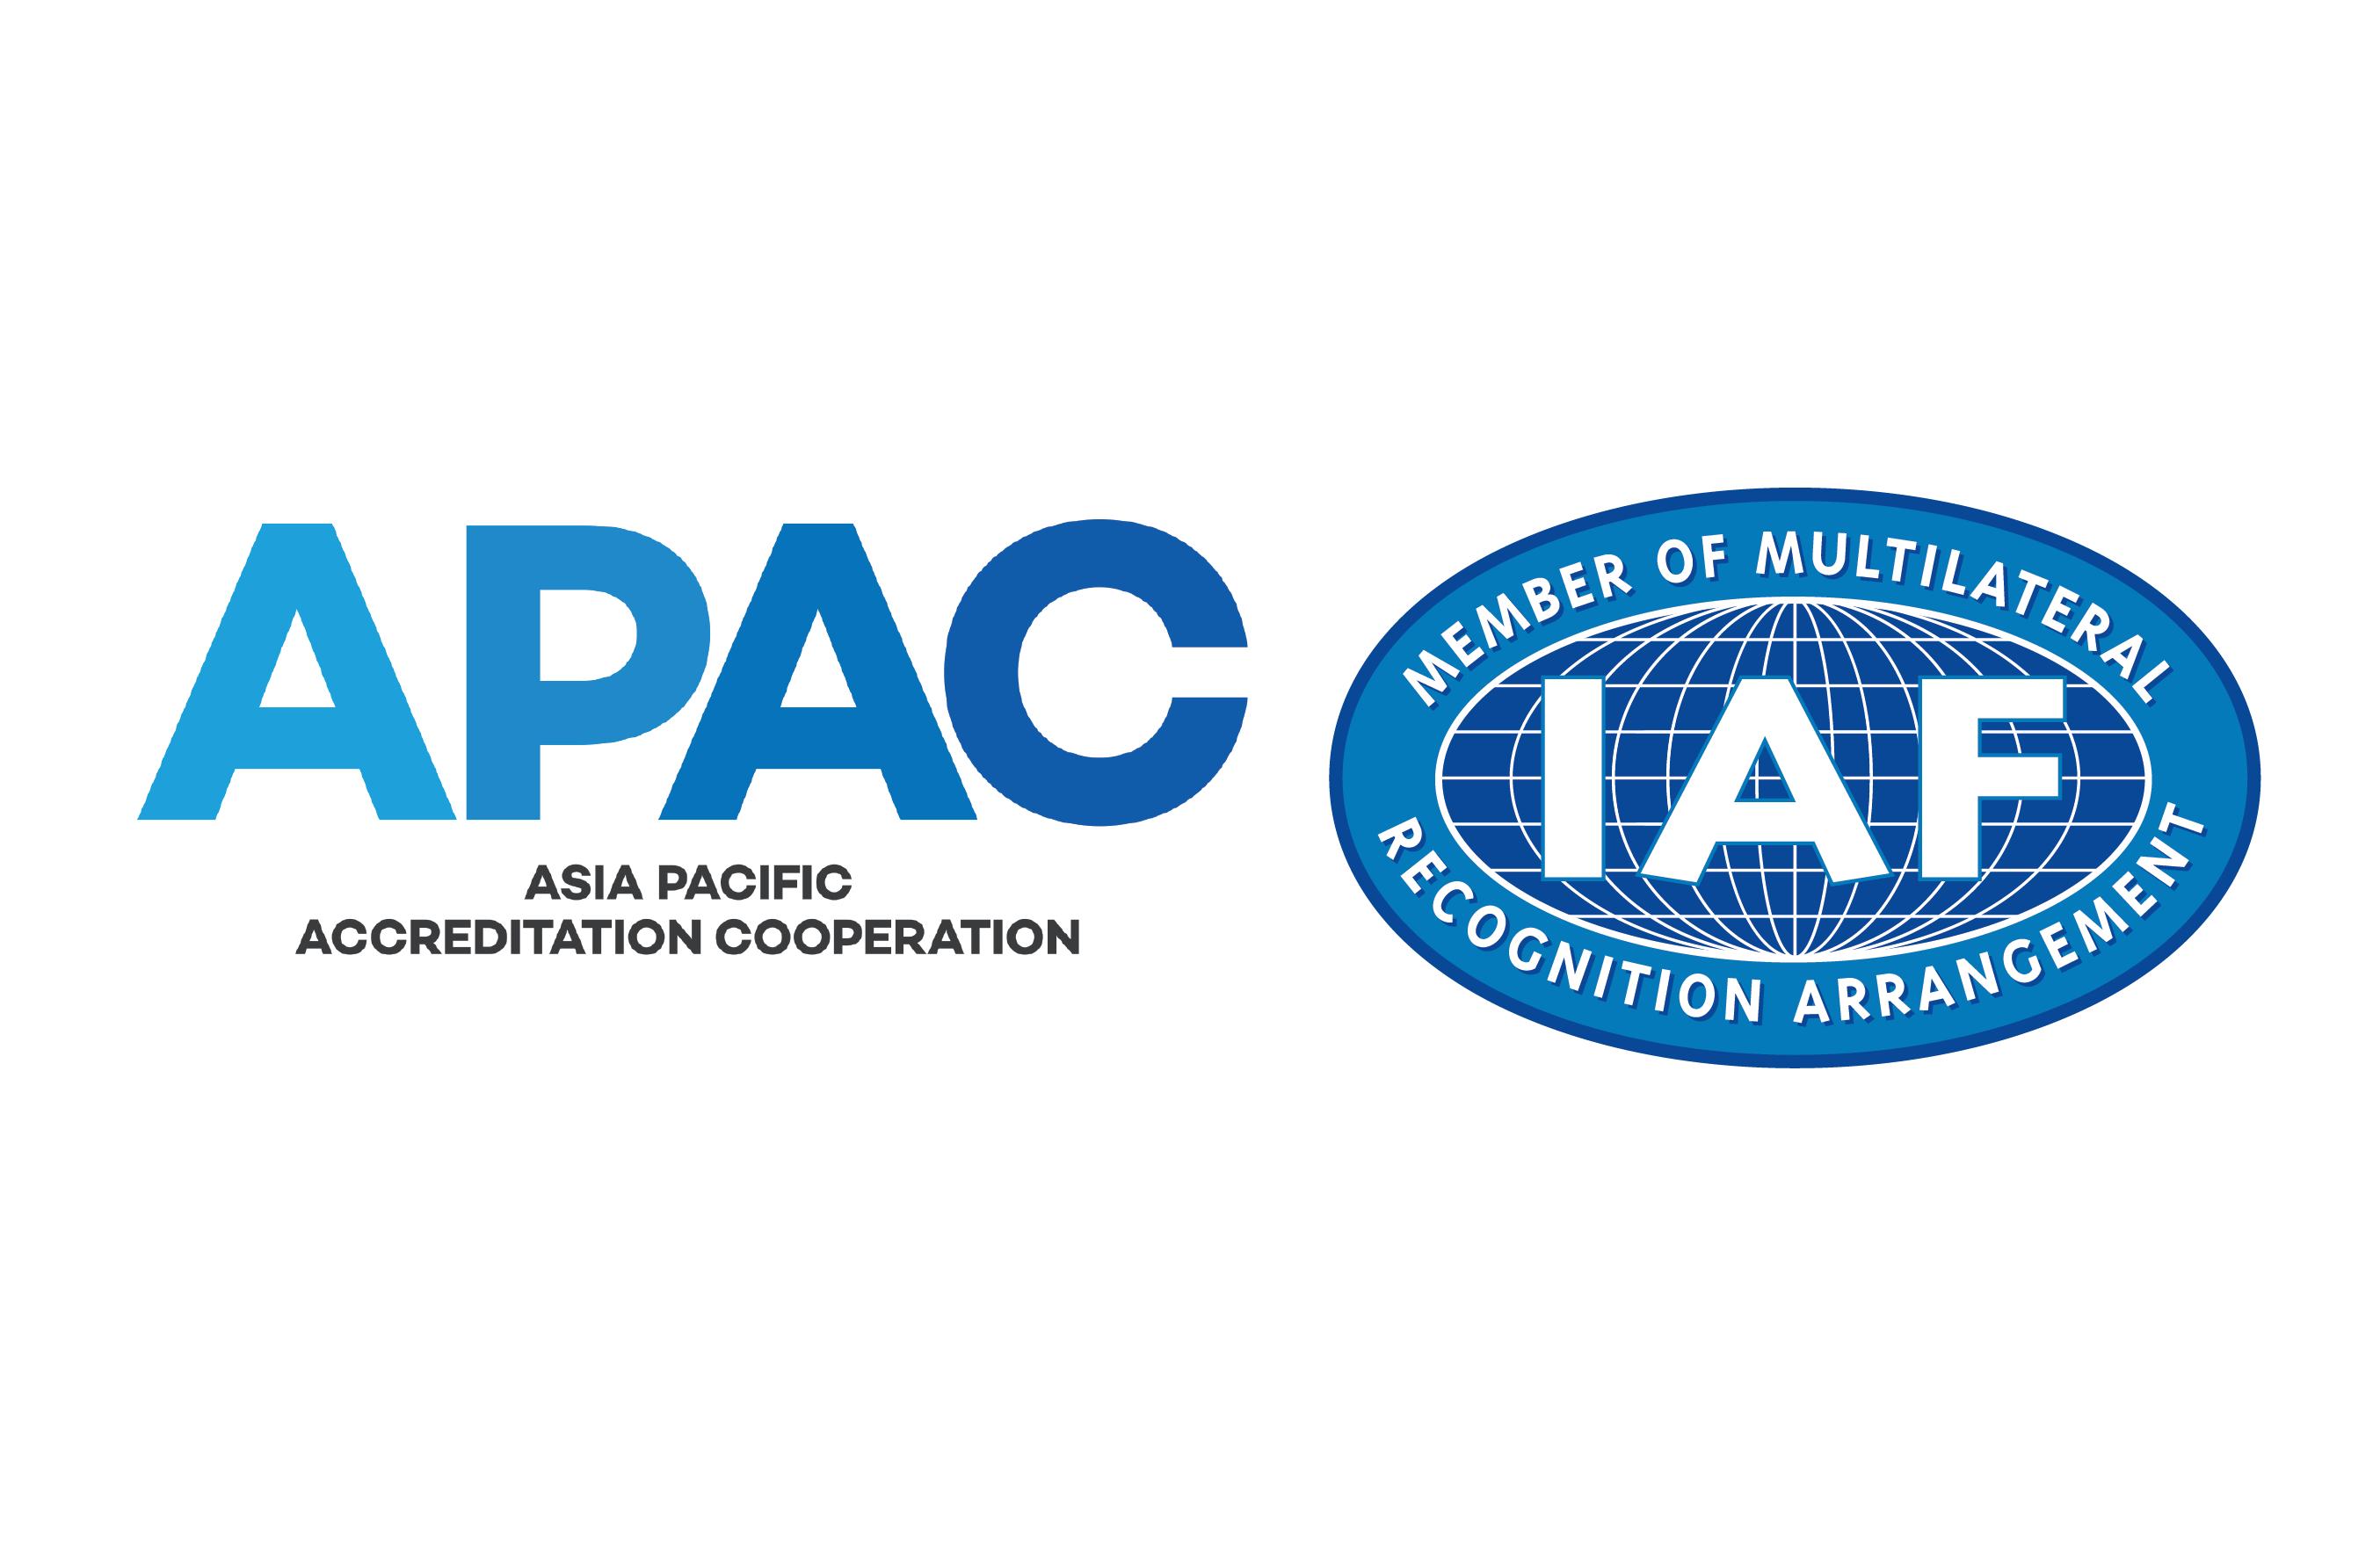 ias-apac-iaf-combined-logo-01